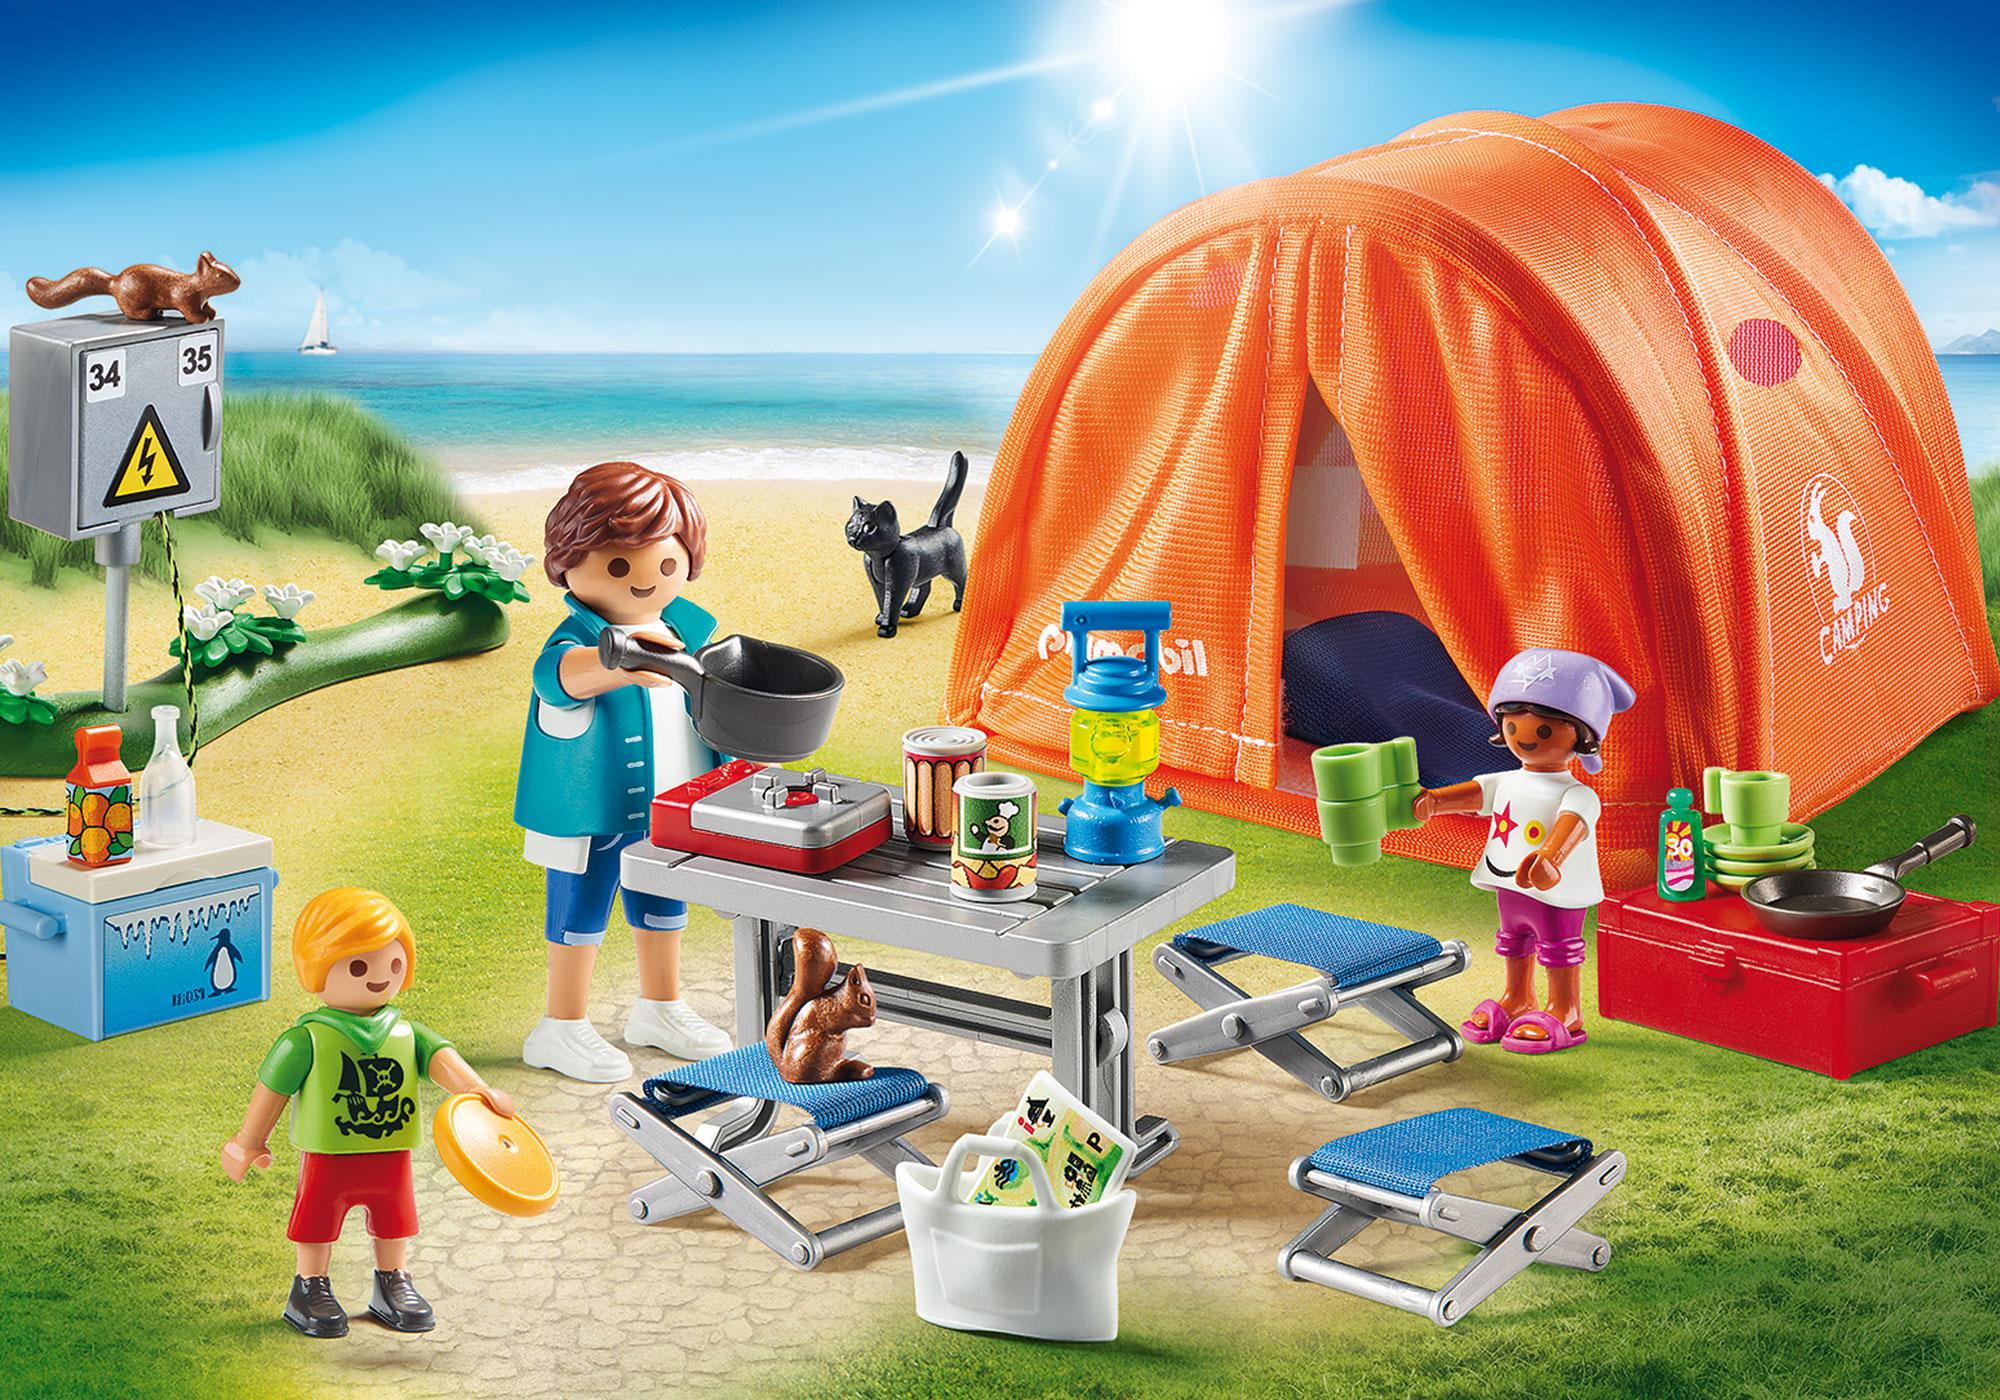 http://media.playmobil.com/i/playmobil/70089_product_detail/Kampeerders met tent